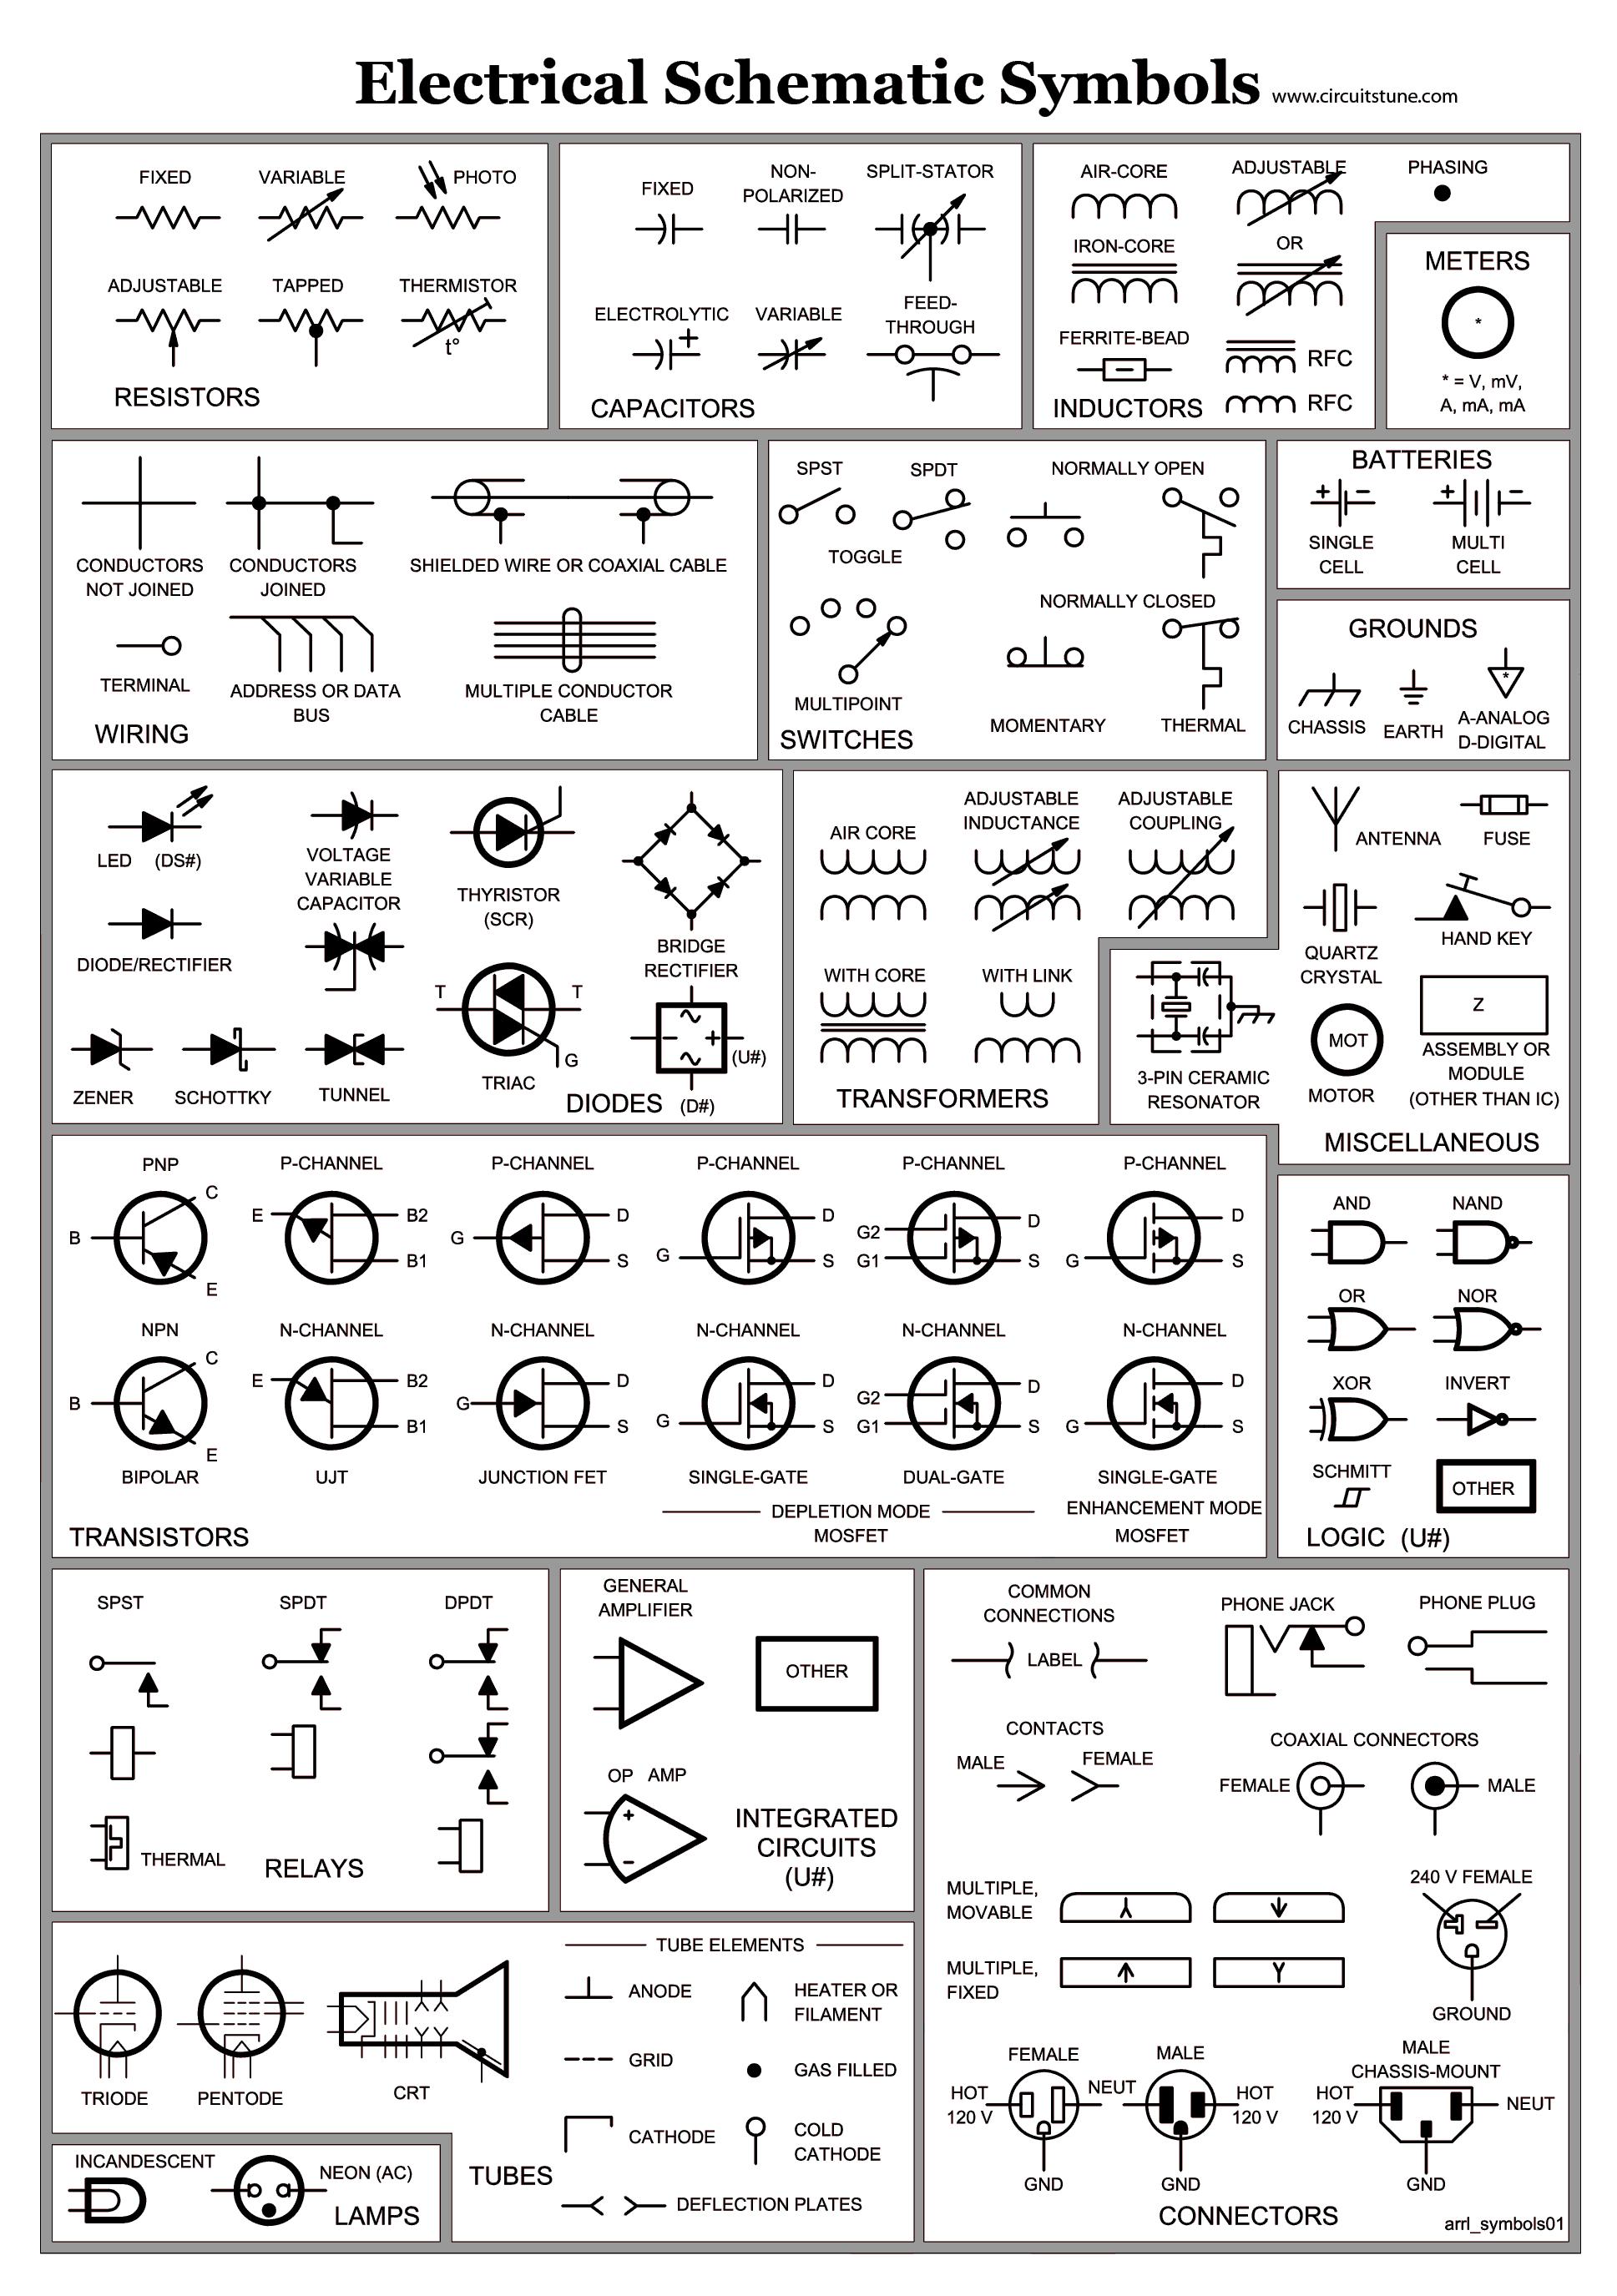 electrical schematic symbols skinsquiggles electrical symbols electrical schematic symbols